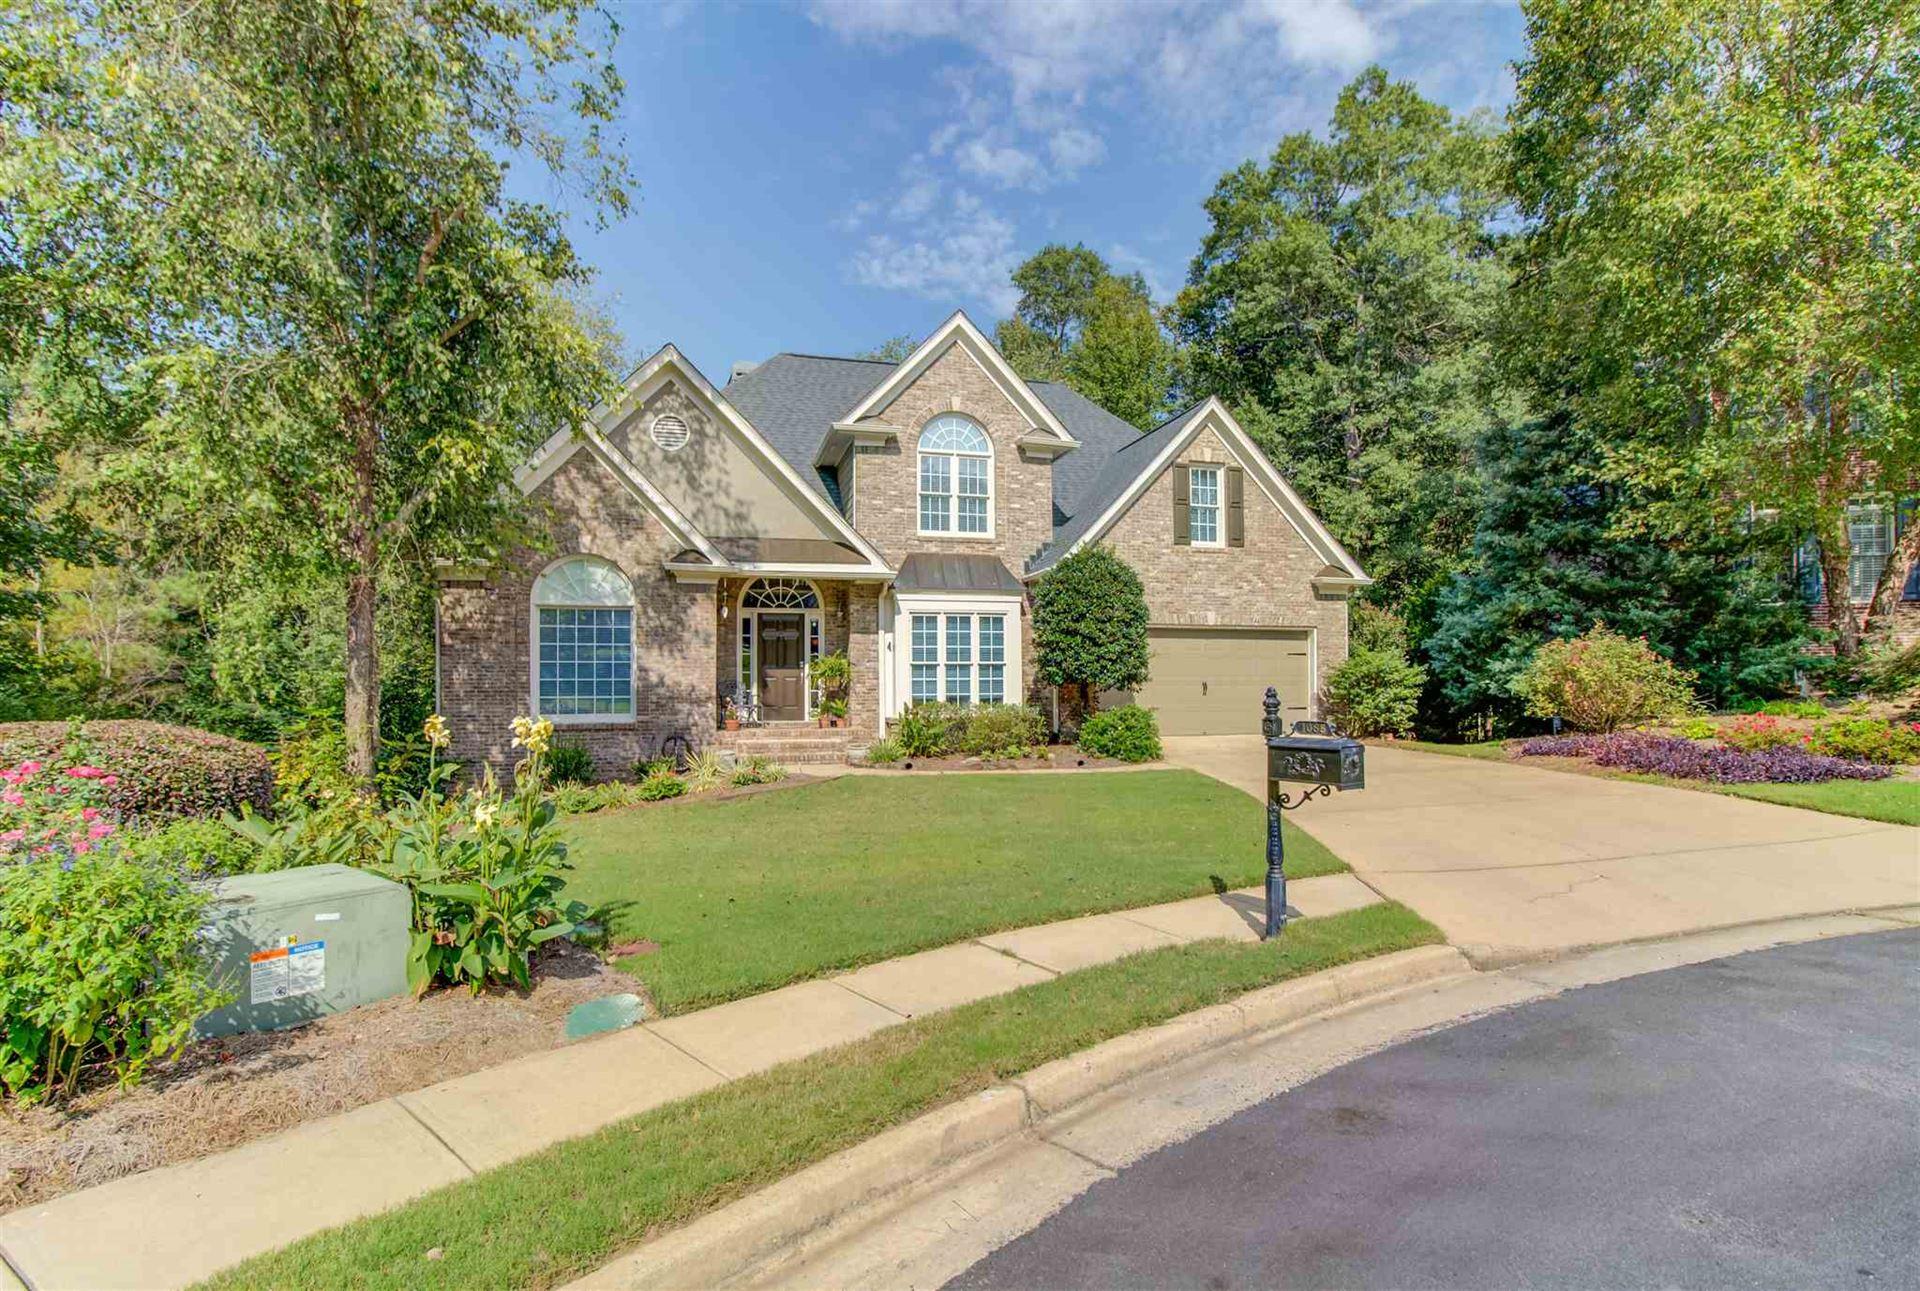 1088 Pughes Creek Way, Lawrenceville, GA 30045 - #: 8868299